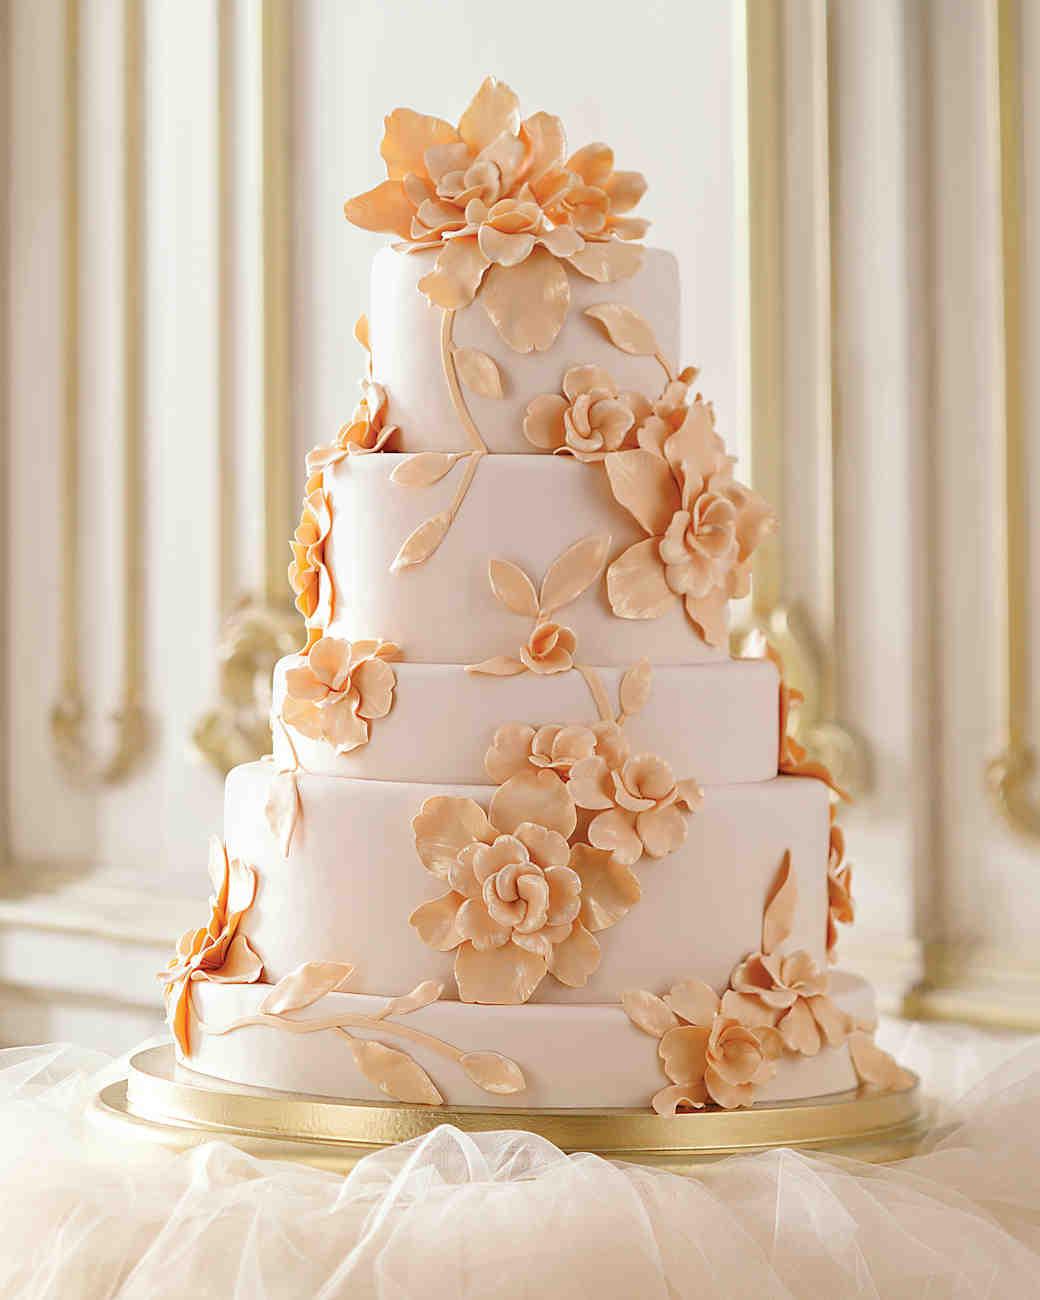 cake-5-0811mwd107413.jpg